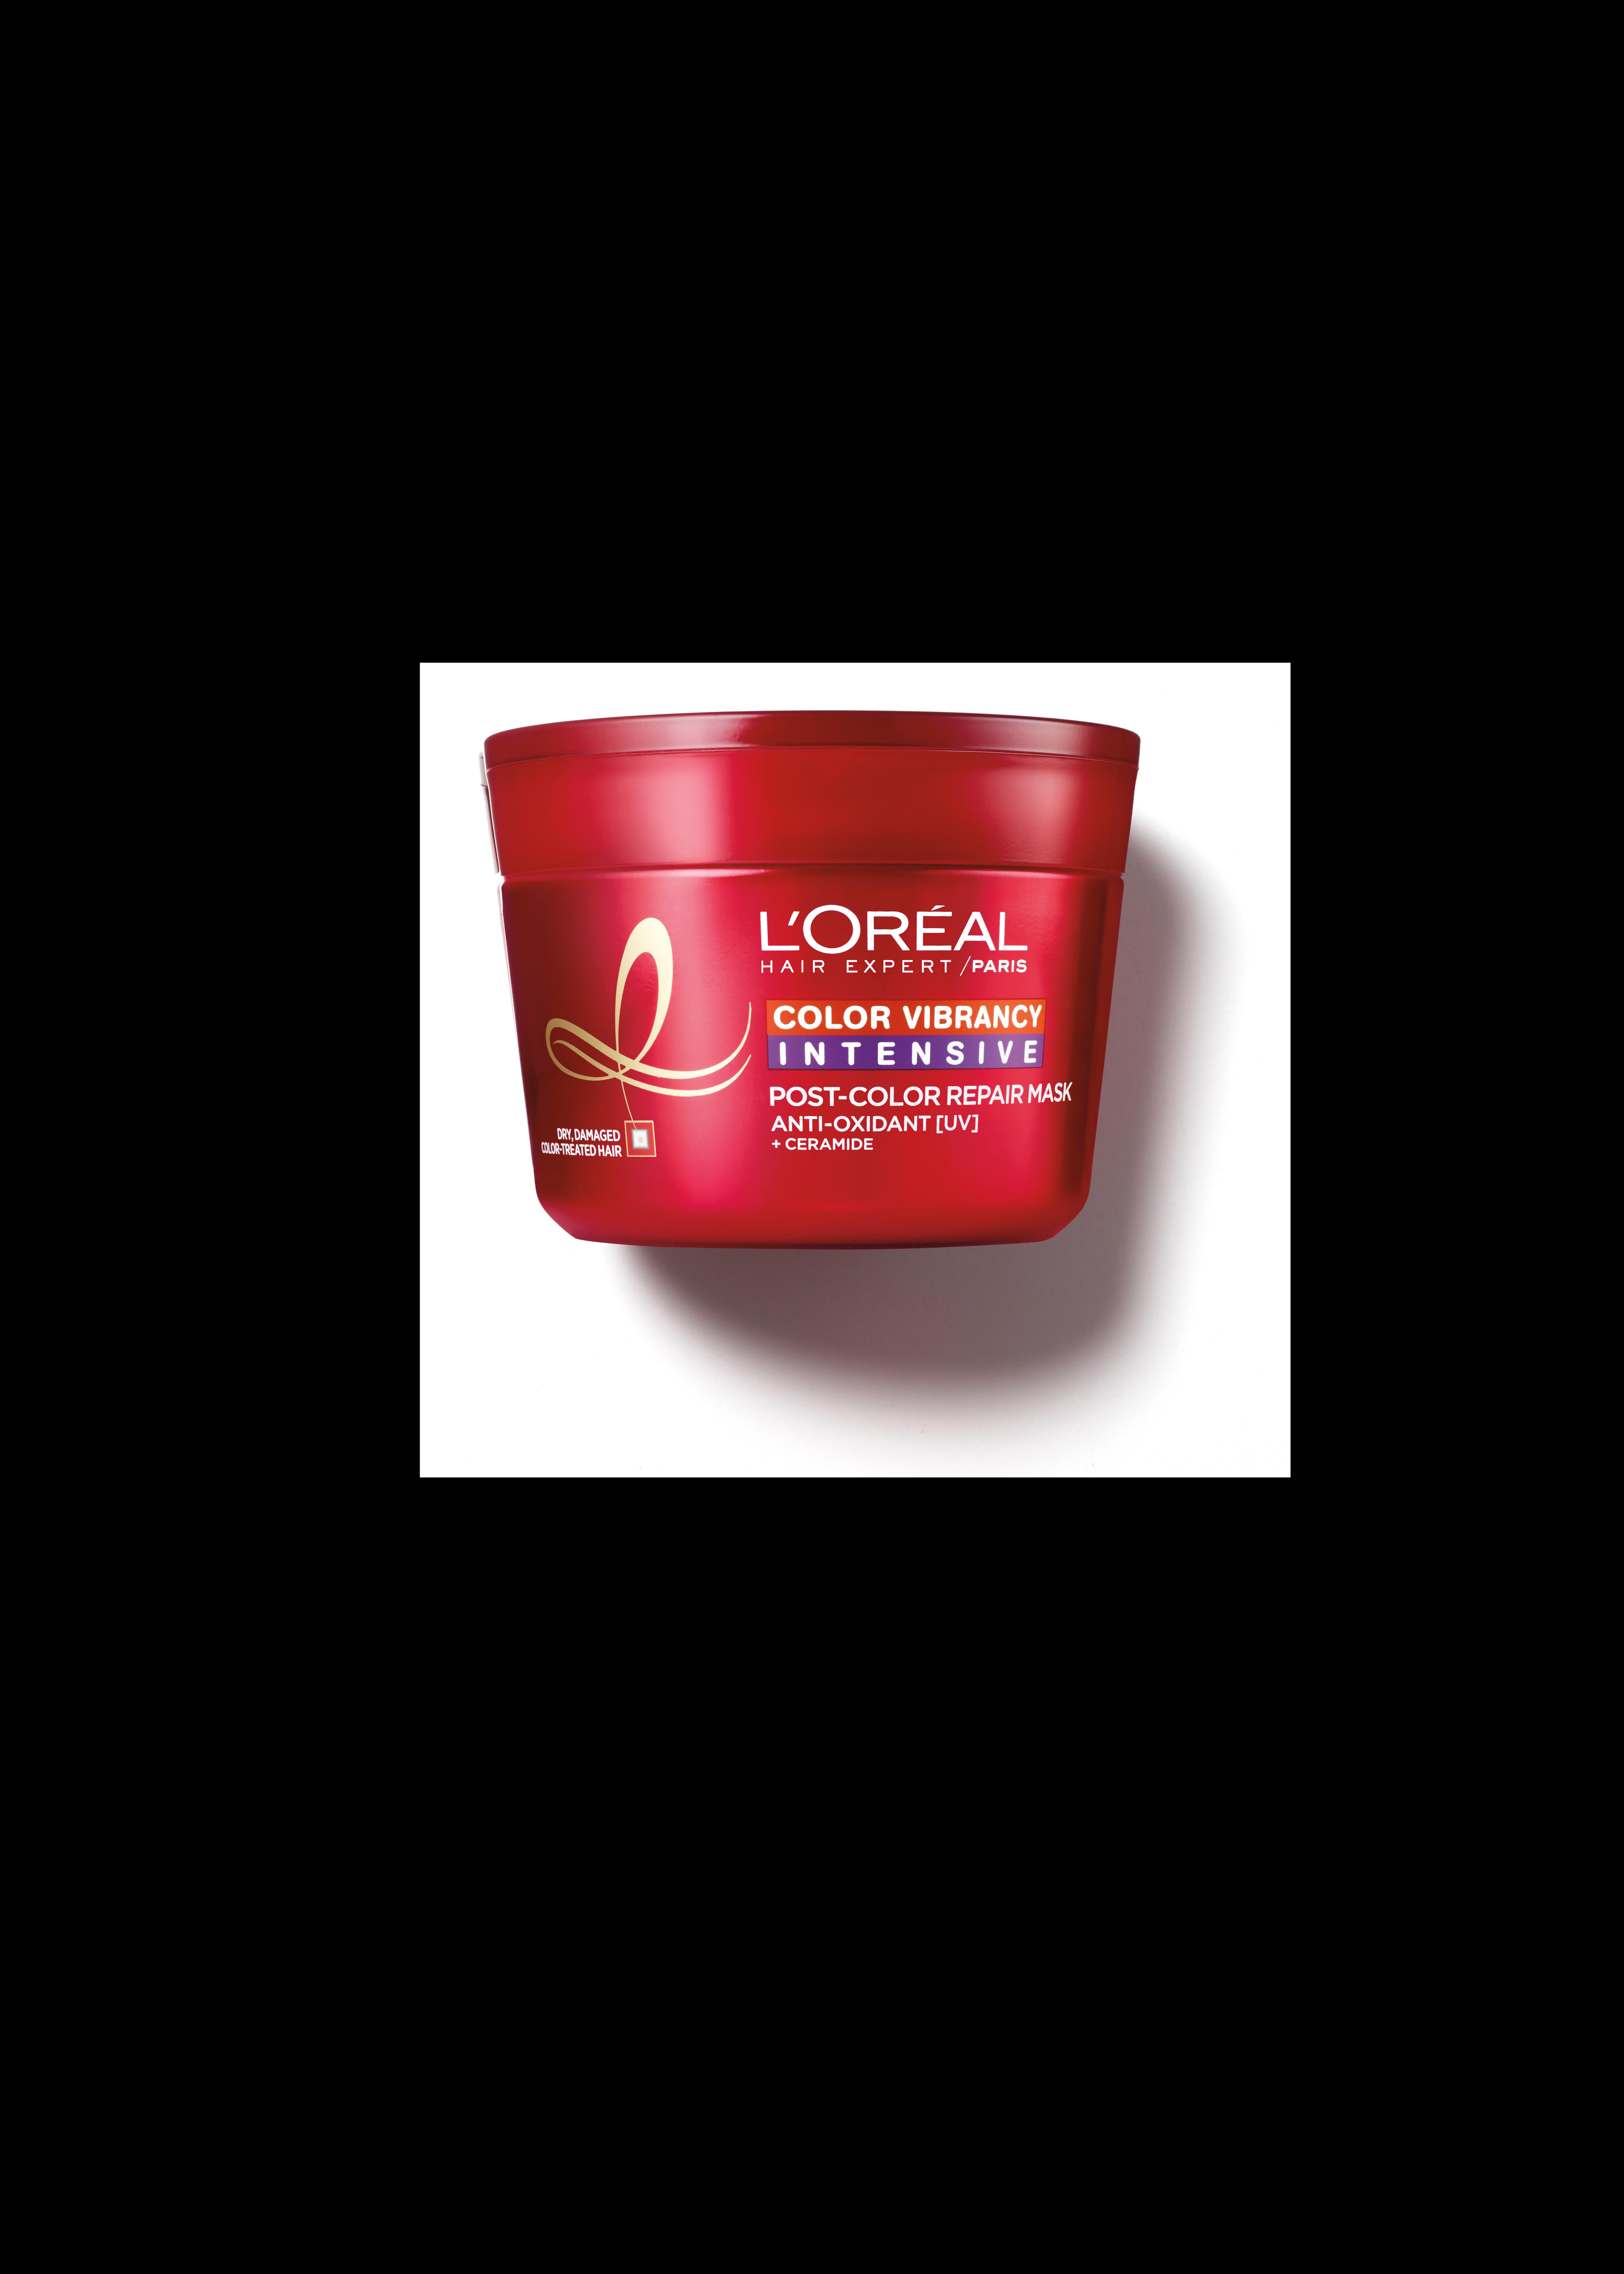 L'Oréal Color Vibrancy Intensive Post-Color Repair Mask